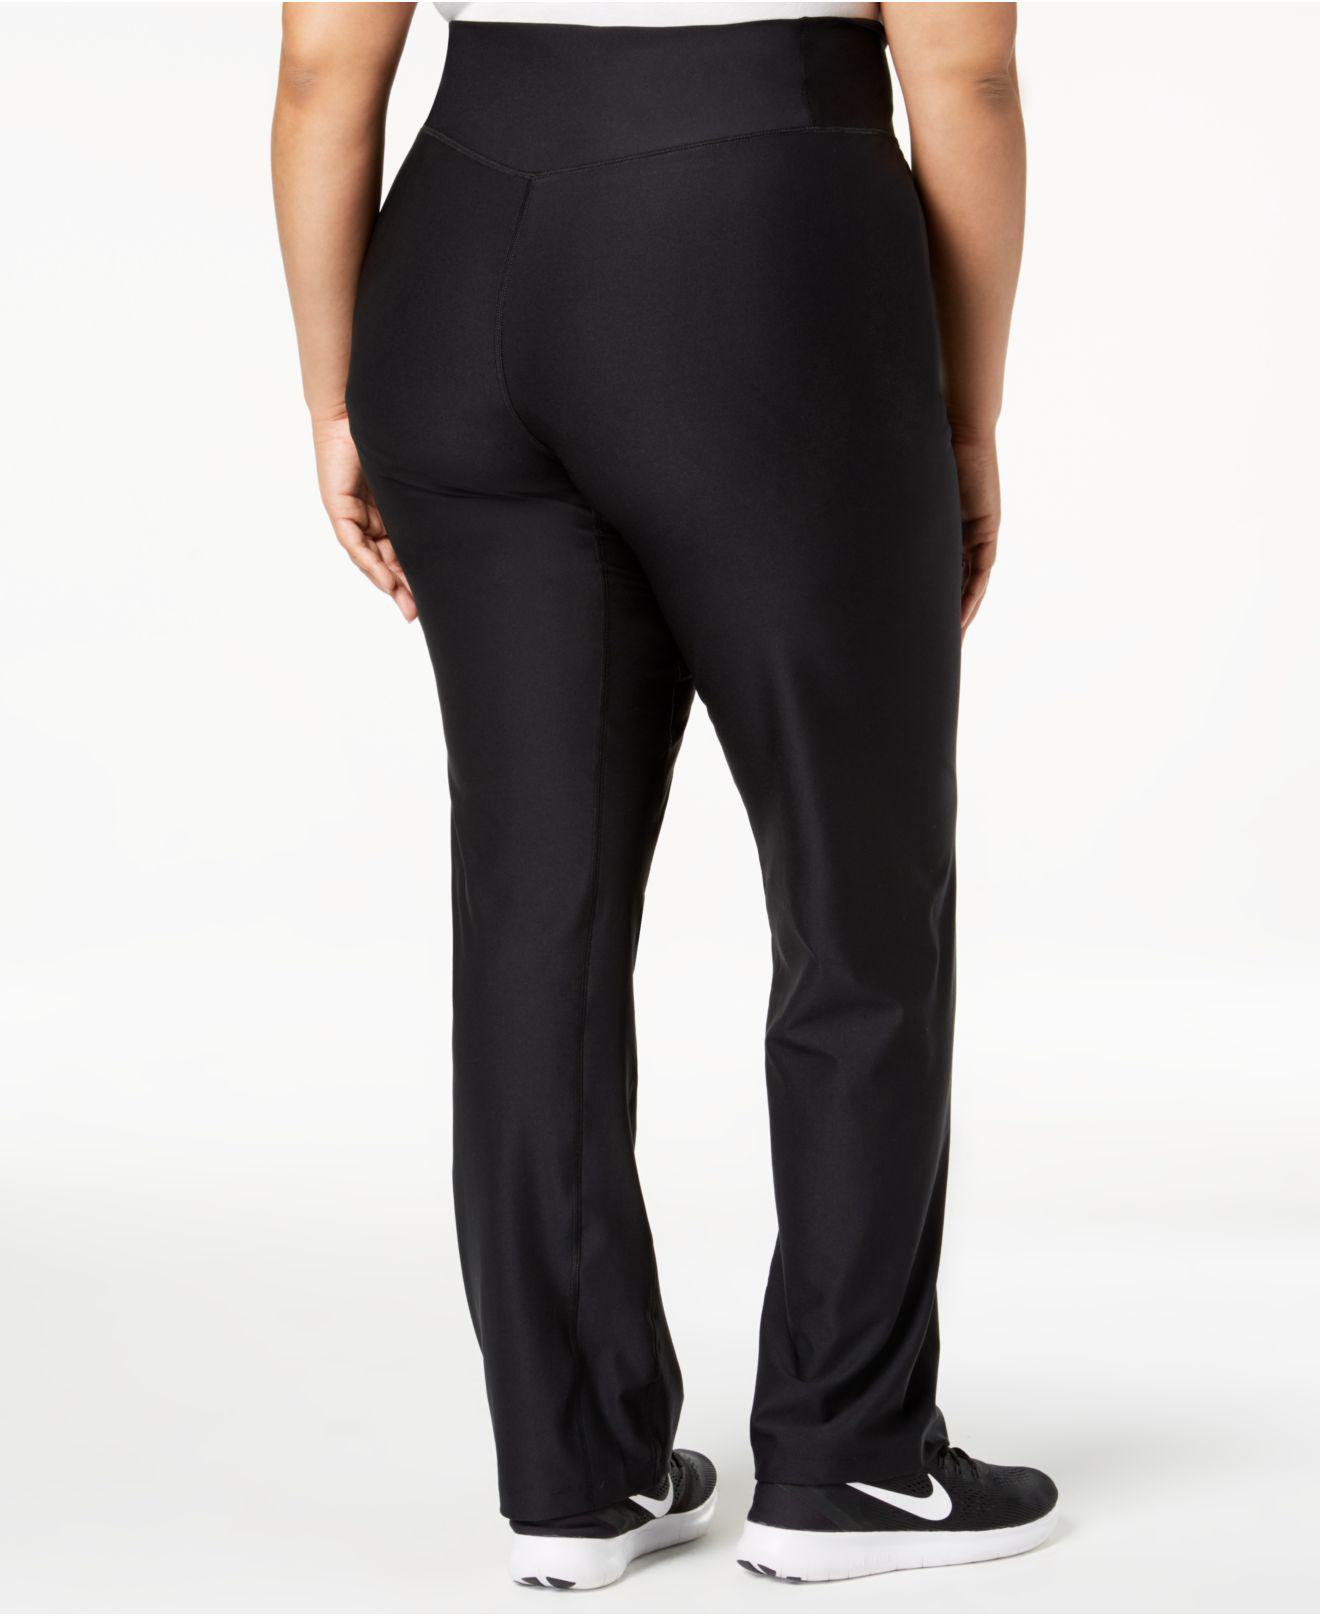 1aa49ce70e376 Lyst - Nike Plus Size Power Dri-fit Pants in Black